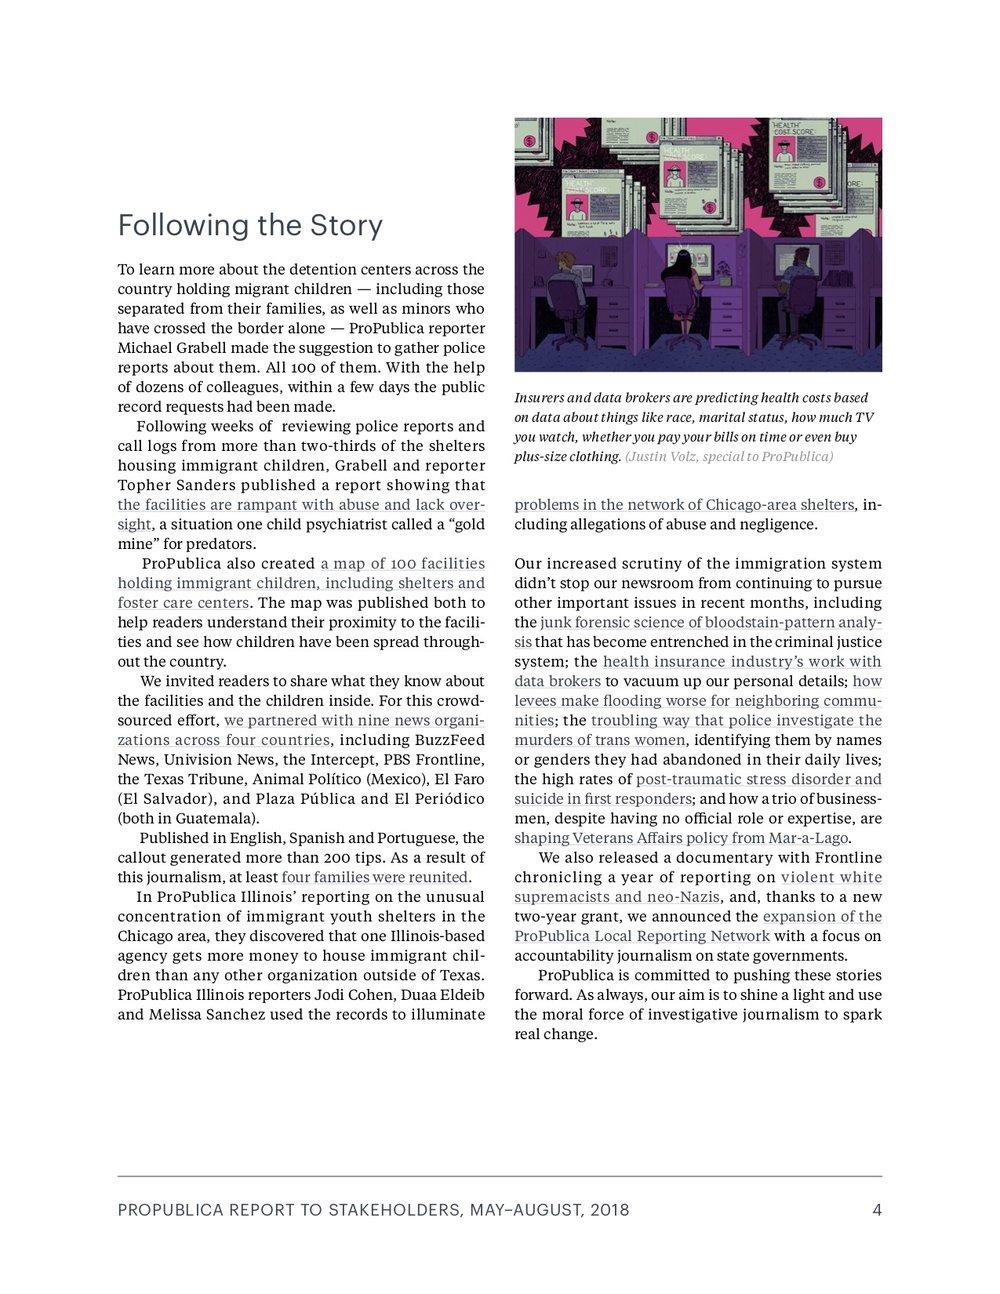 propublica-2018-2nd-interim-report 2 (dragged) 4.jpg